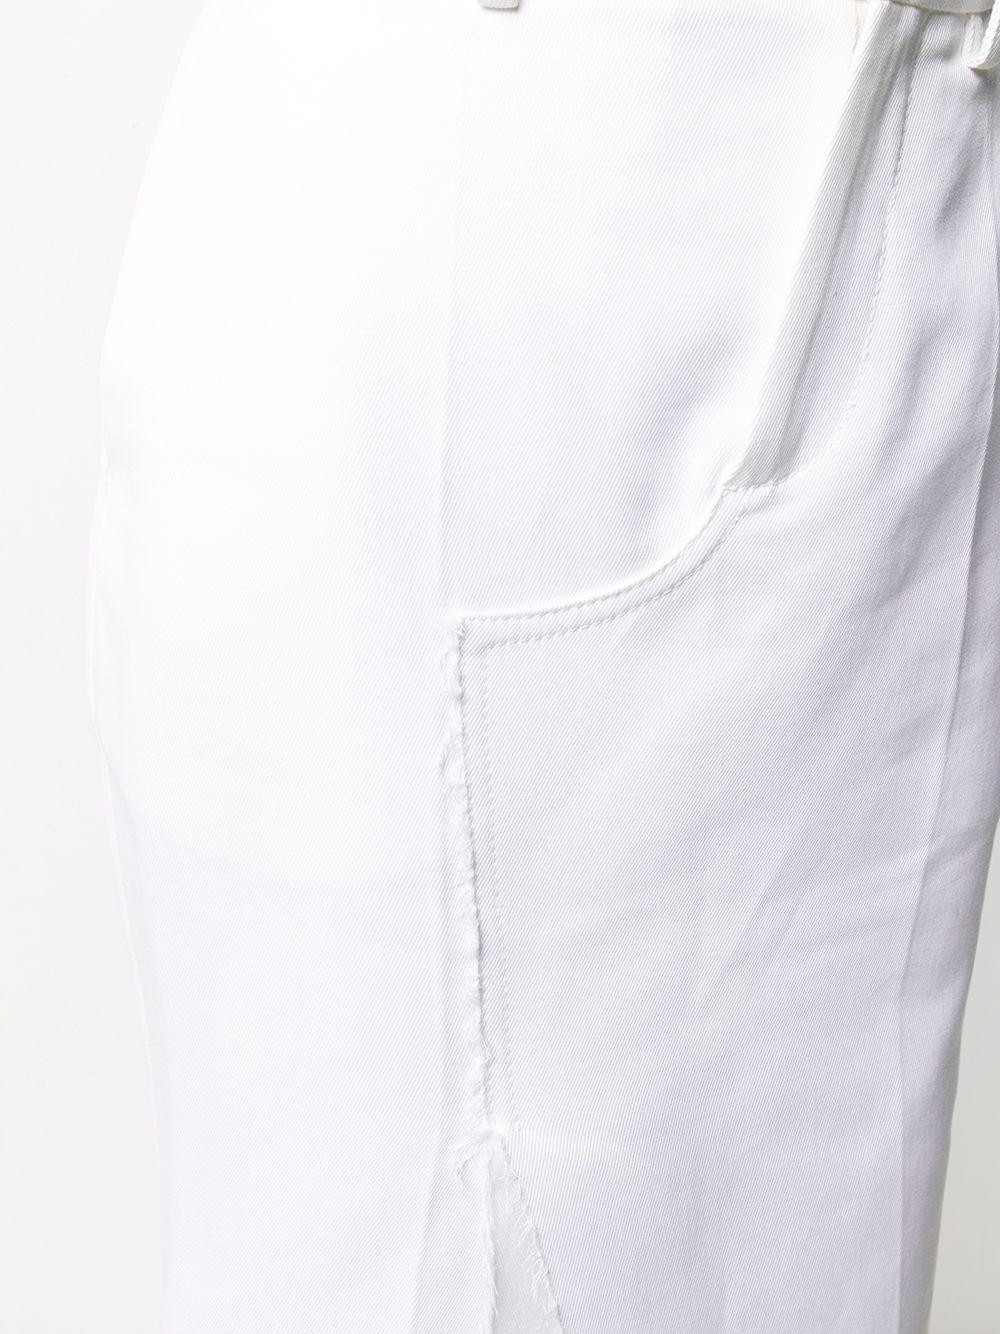 Marni | Marni юбка с разрезом | Clouty